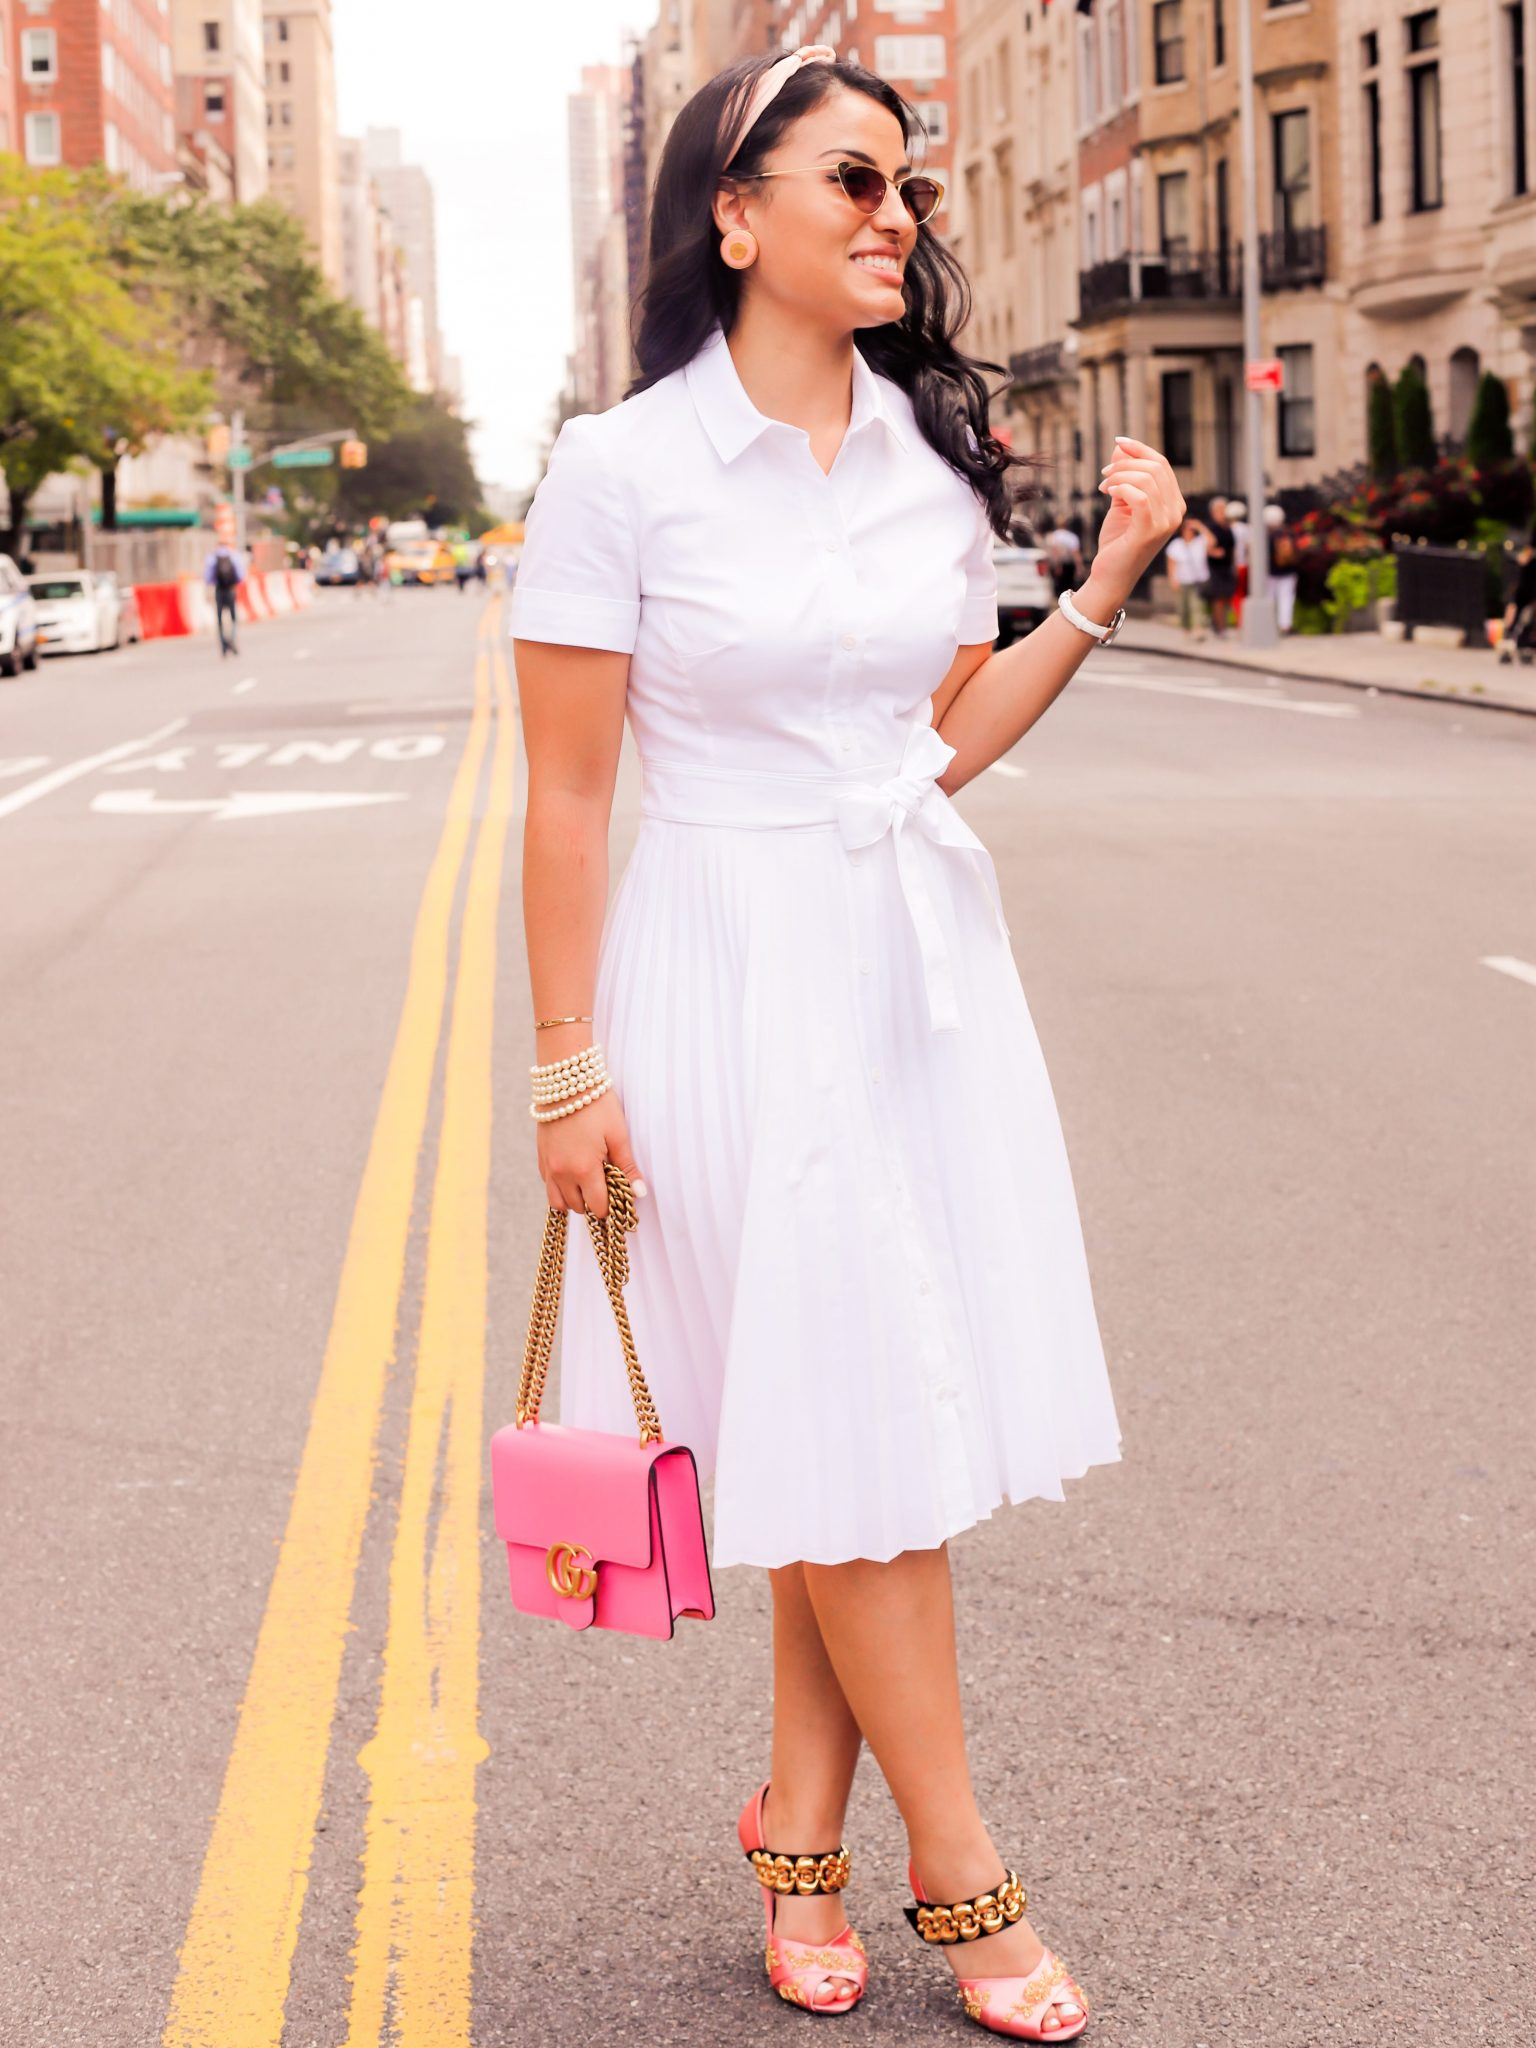 62e9f40c2406 Gucci Marmont Gg Small Leather Pink Shoulder Bag (Tradesy)